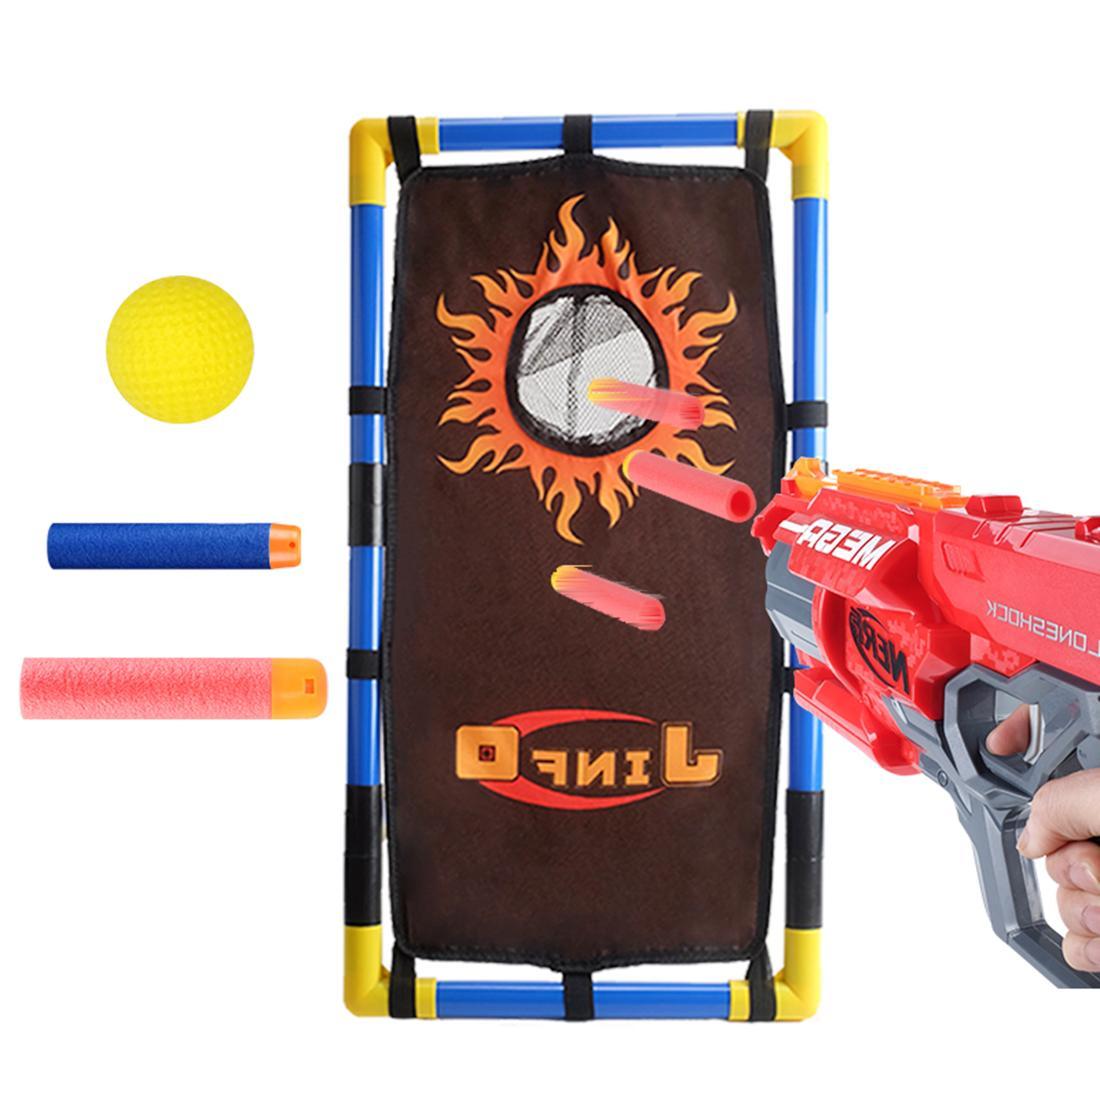 Stand Scoring Aim Target Frame <font><b>Nerf</b></font> Funny Toys Tactical Soft Foam Shot/Sucker Shot Shooting